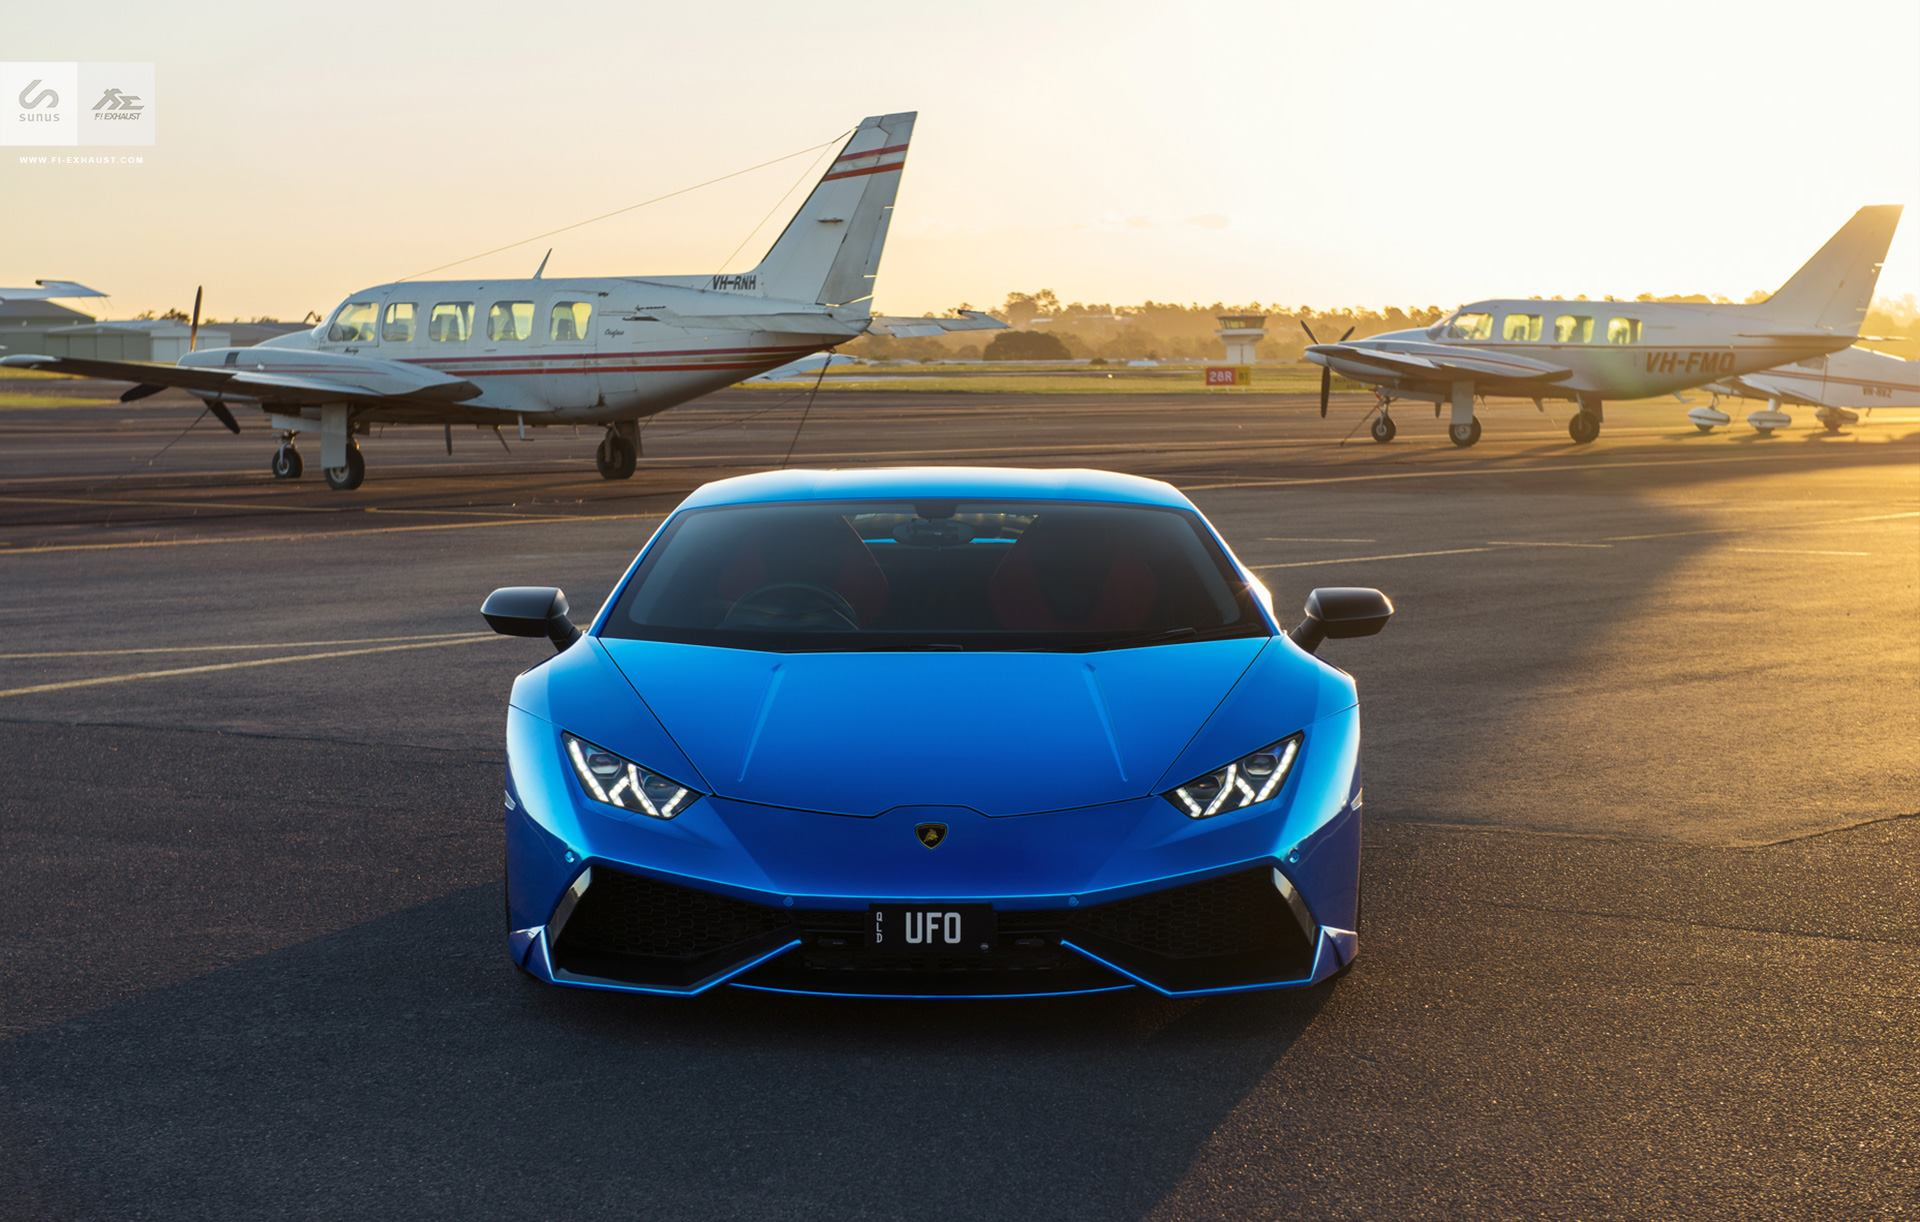 Stunning Blue Chrome Lamborghini Huracan by Sunus Motorsport